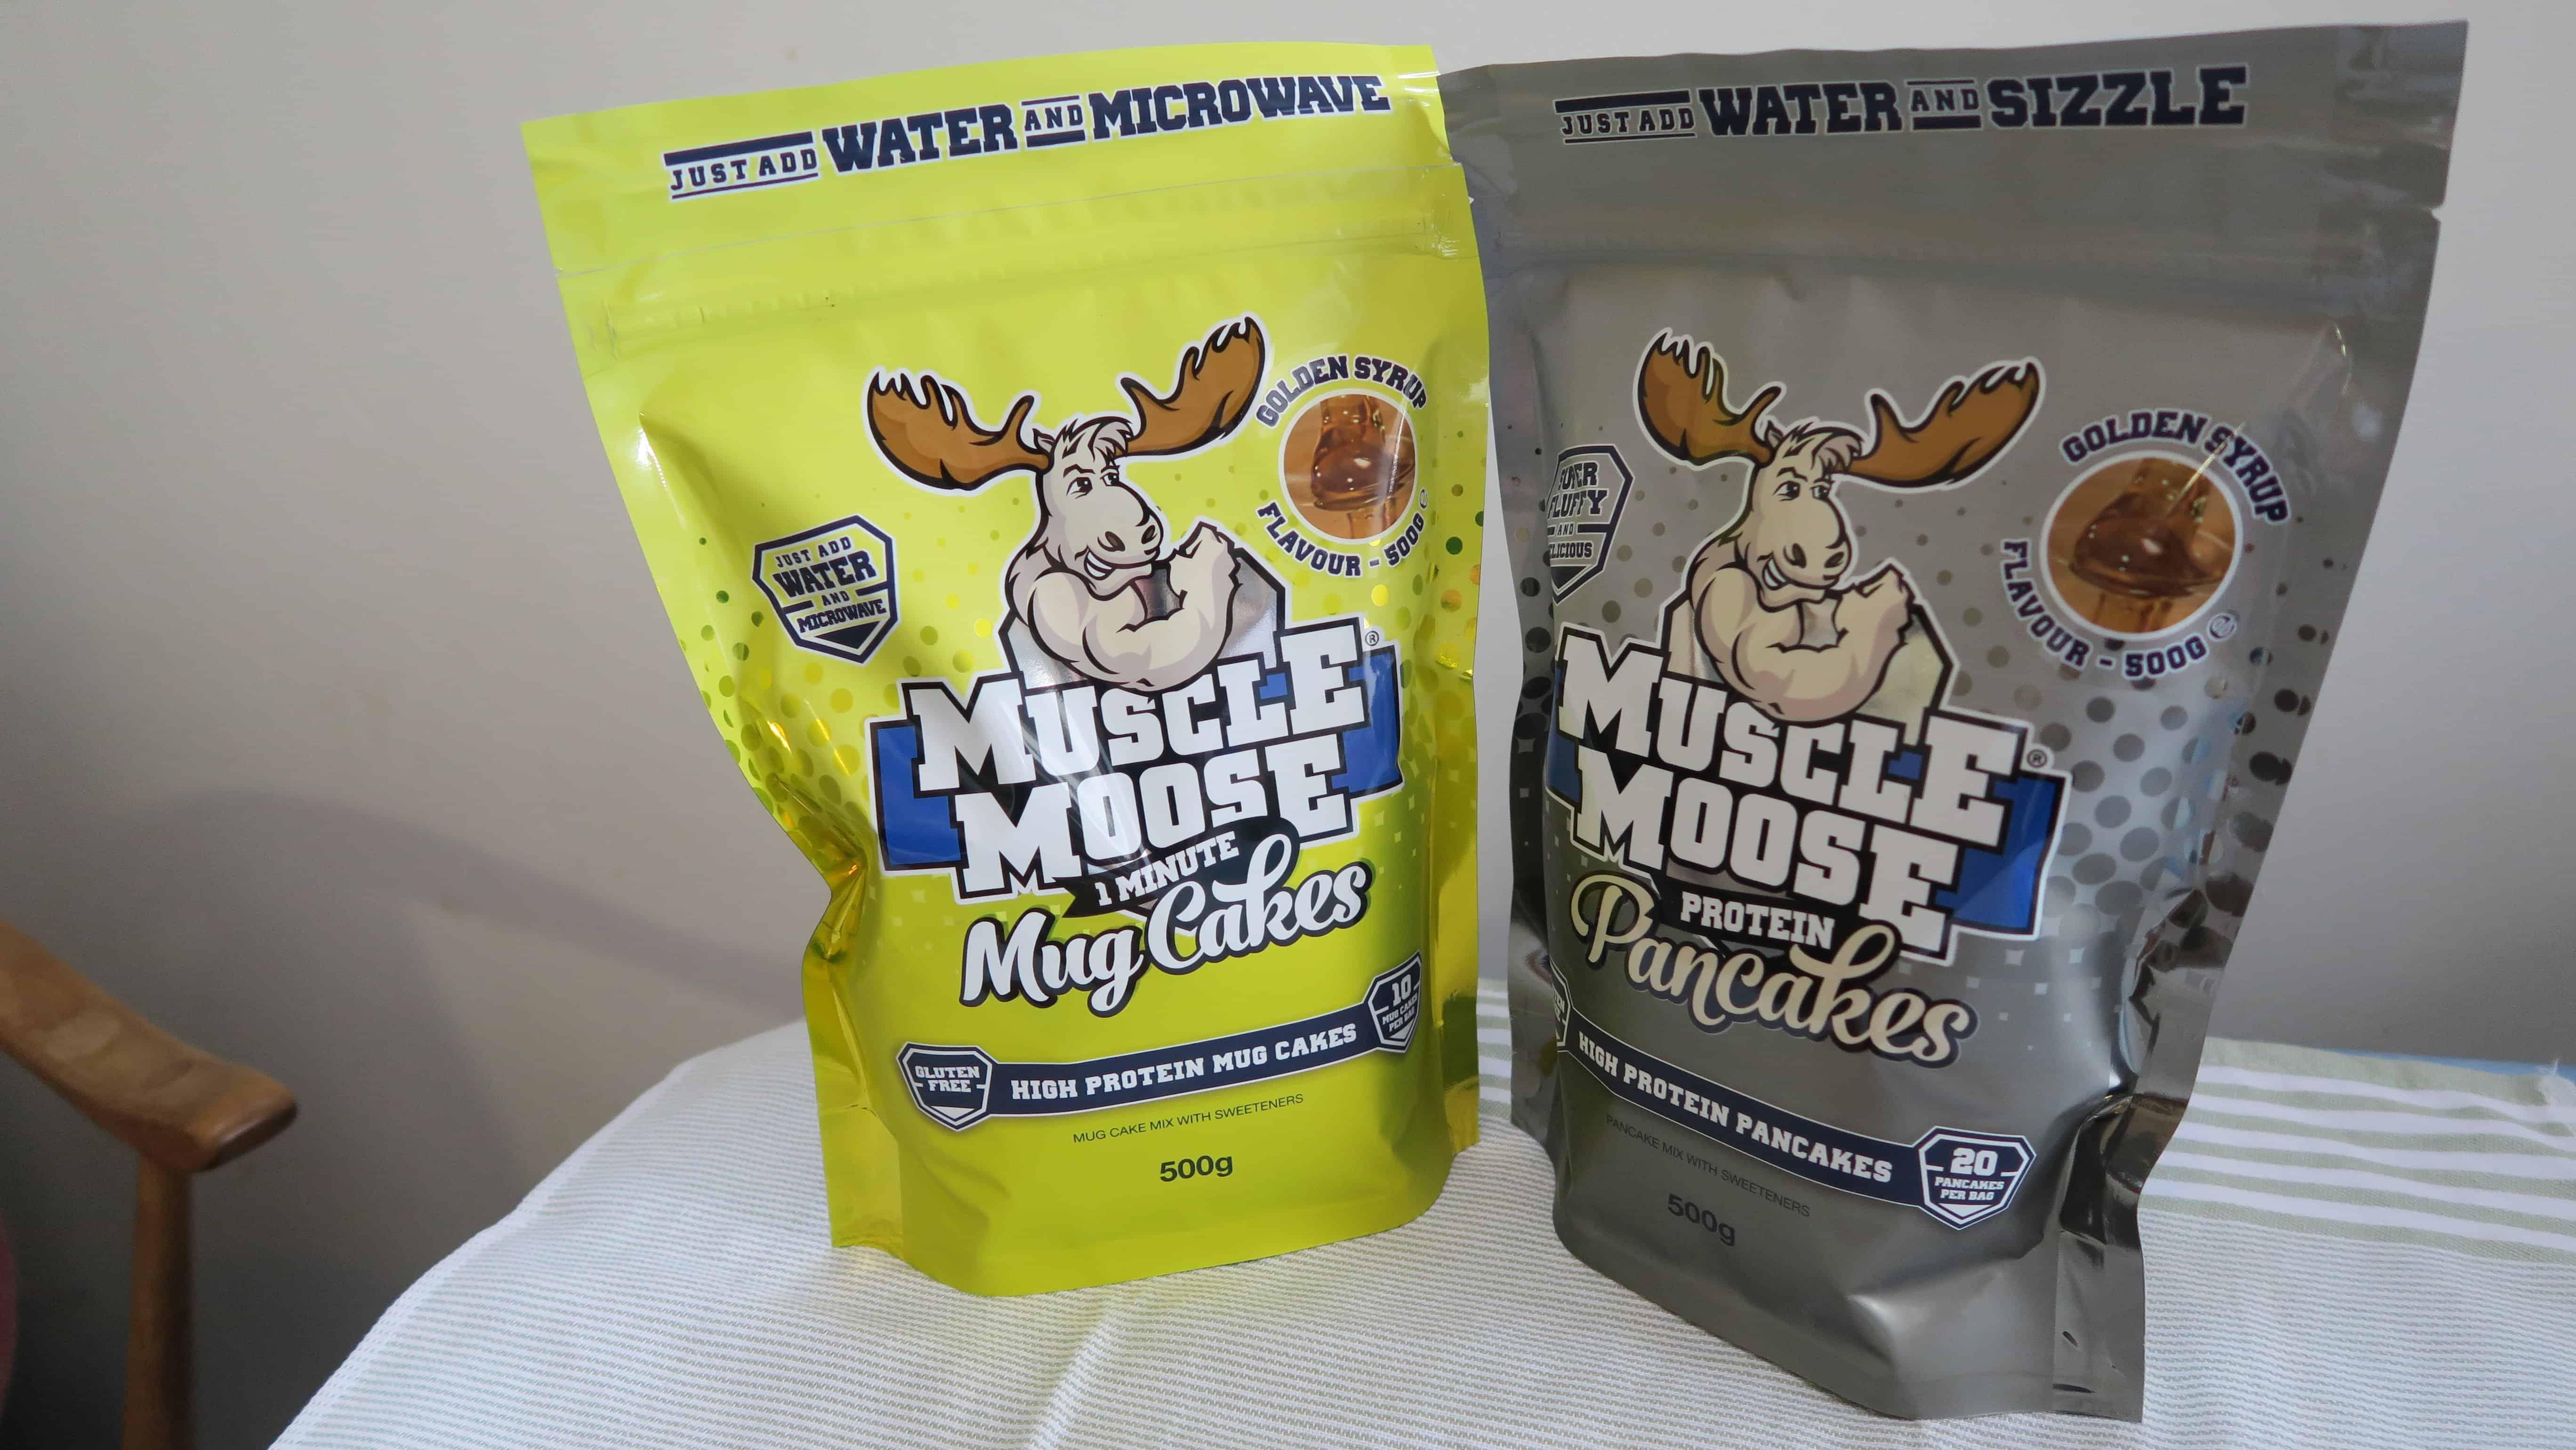 muscle moose mug cakes and muscle moose pancakes